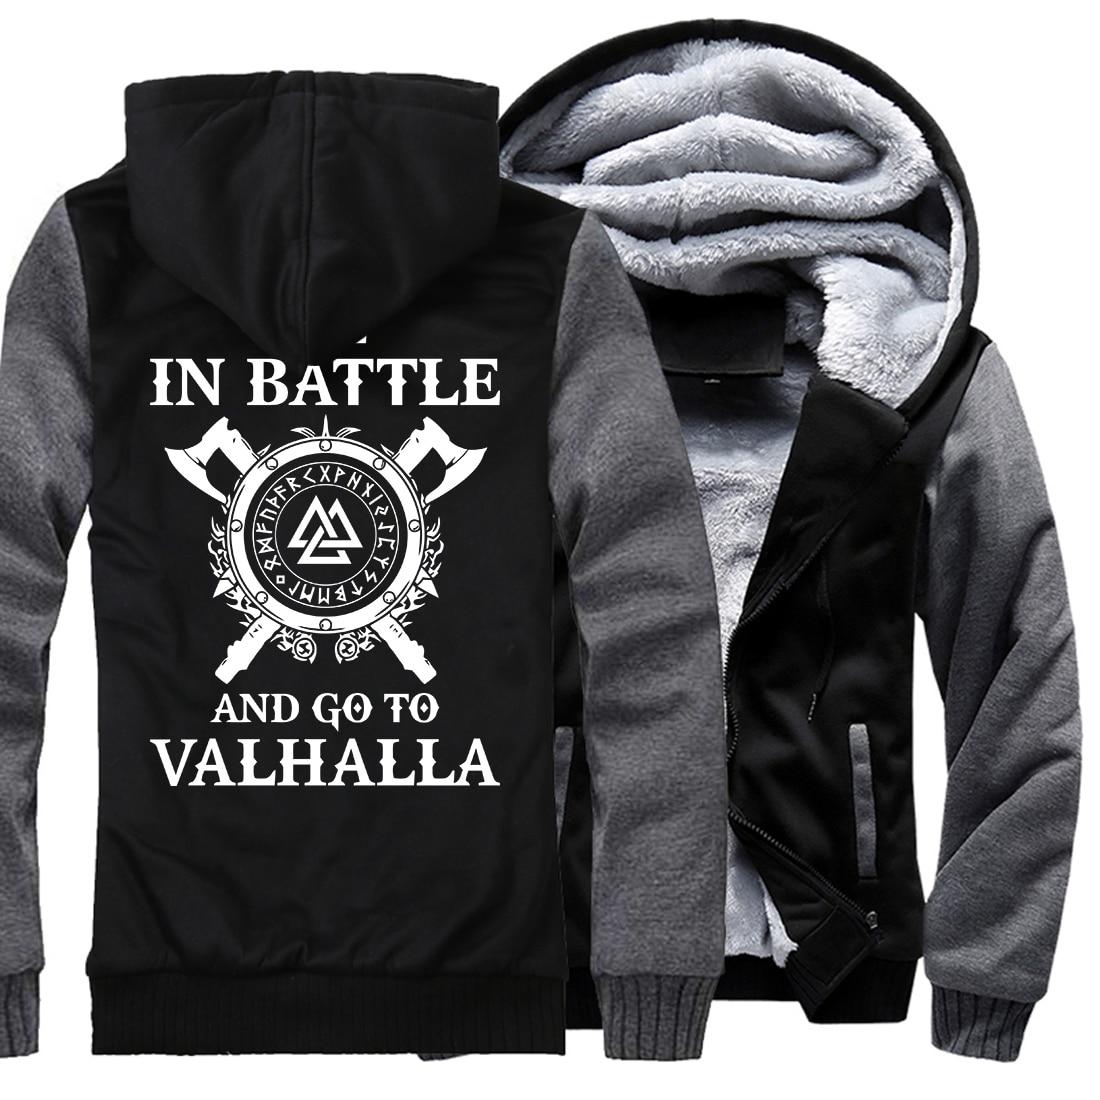 Männer casual wolle liner marke trainingsanzüge Winter verdicken mit kapuze sweatshirts Odin Viking hip-hop mode Vikings Odin jacken 2018